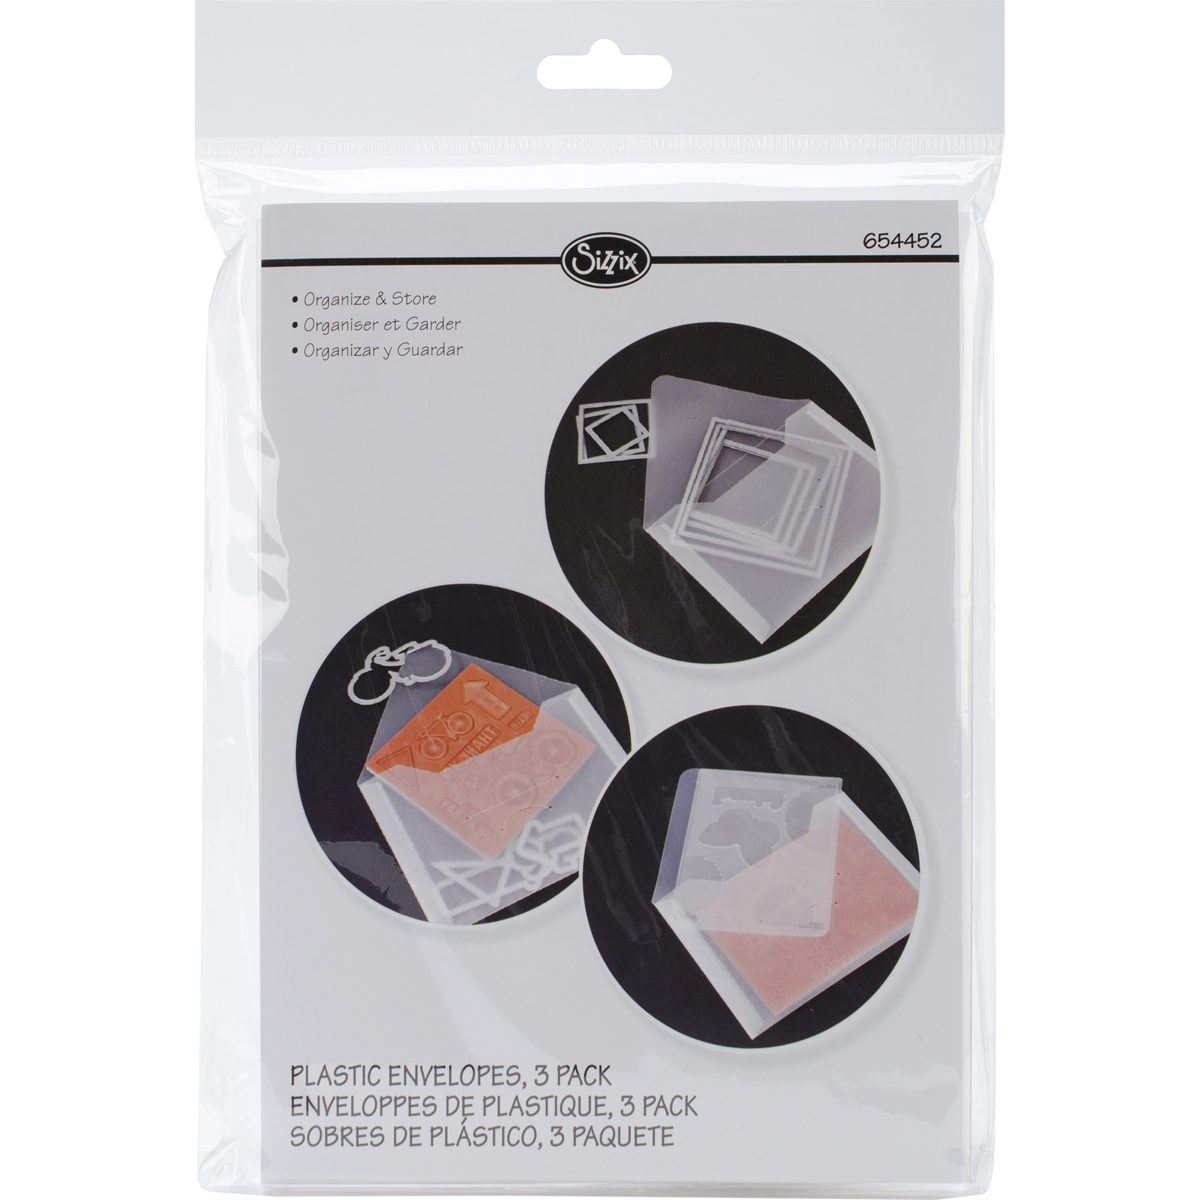 Sizzix Plastic Envelopes 3/Pkg